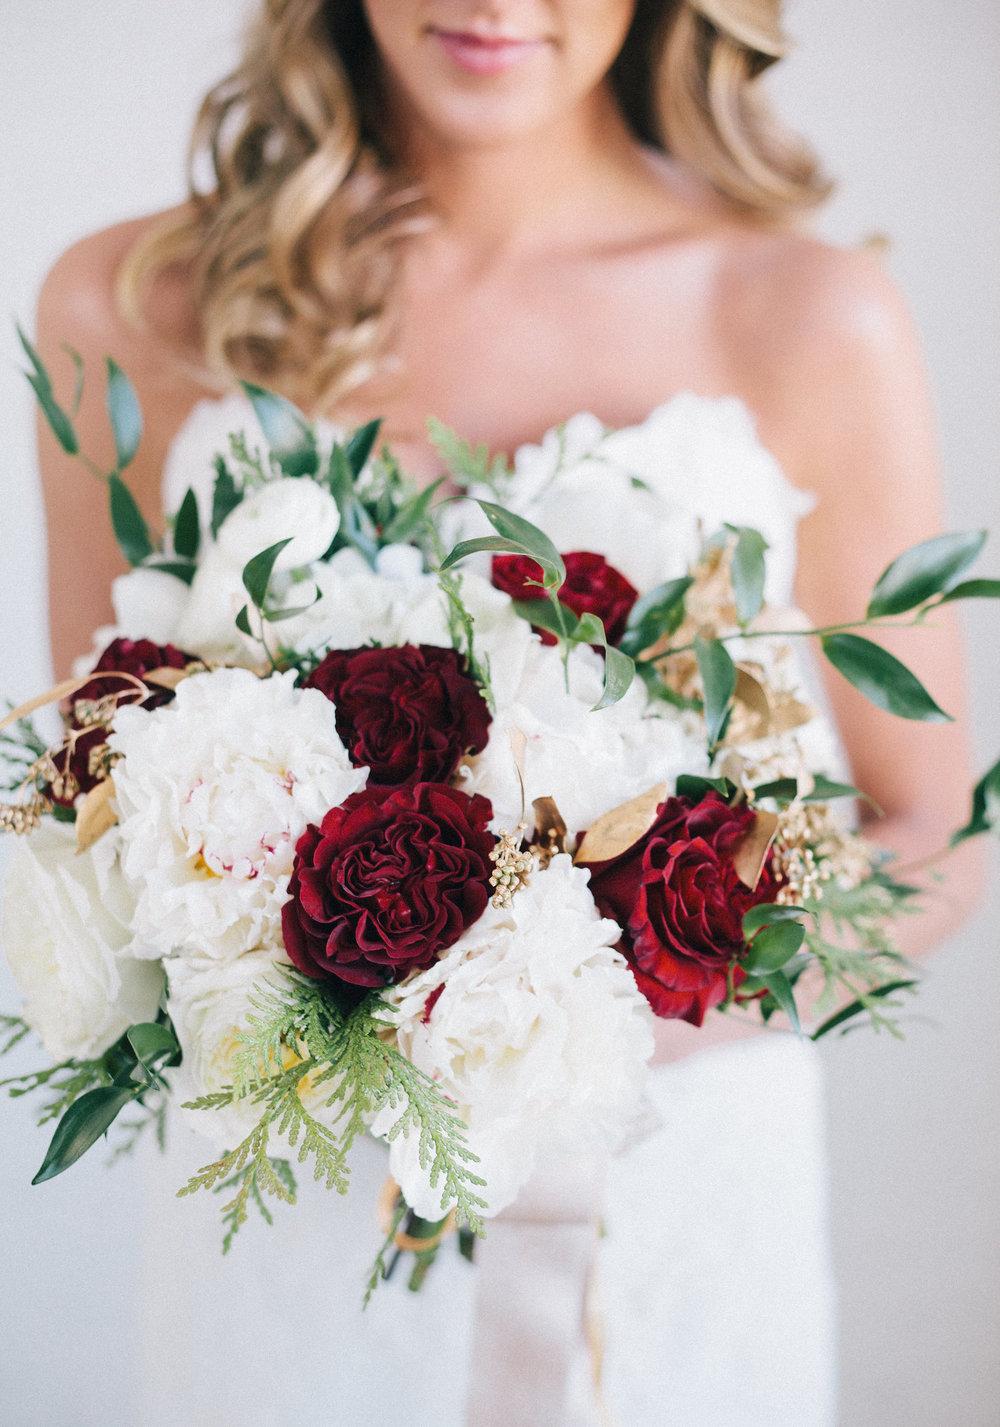 White and Red Winter Wedding Flowers - Winnipeg Wedding Florist